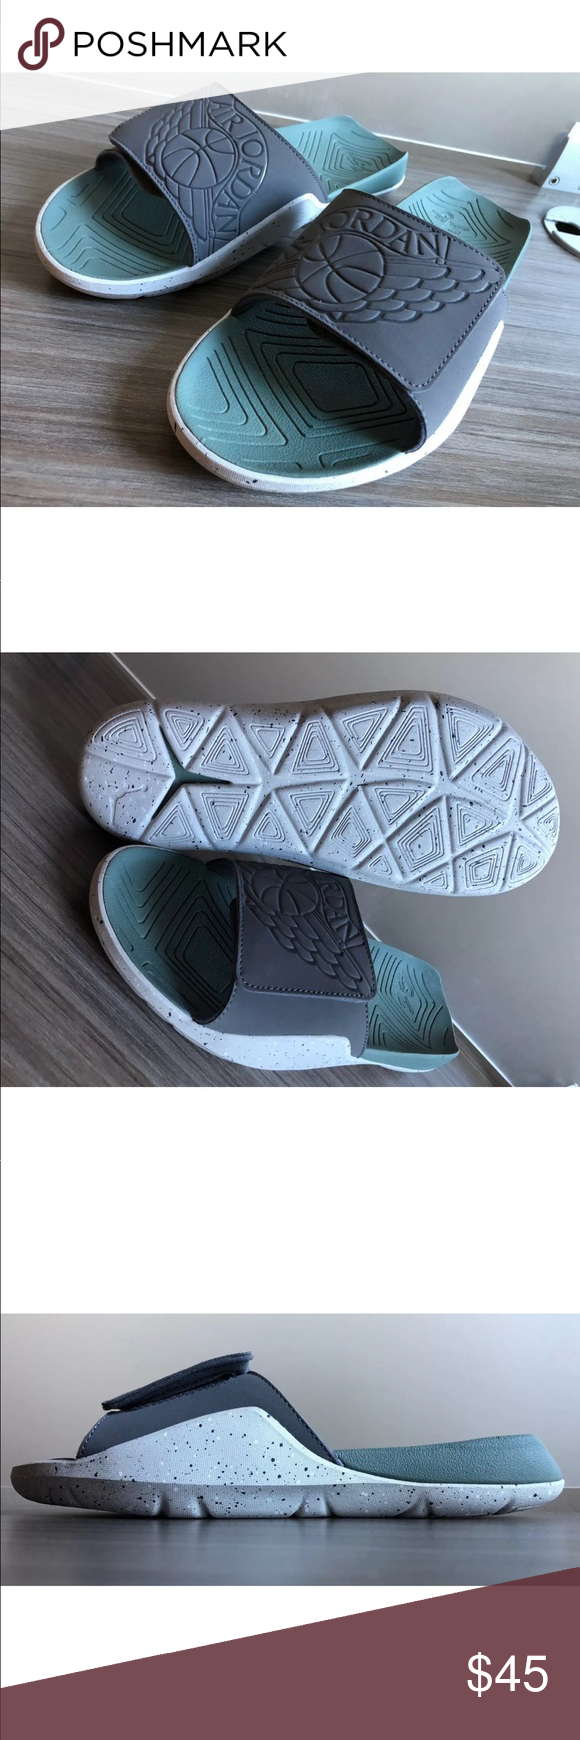 cfcc07741eb3 Men s Nike Air Jordan Hydro 7 Slides NEW AUTHENTIC NIKE Air Jordan Hydro 7  SLIDES COLOR